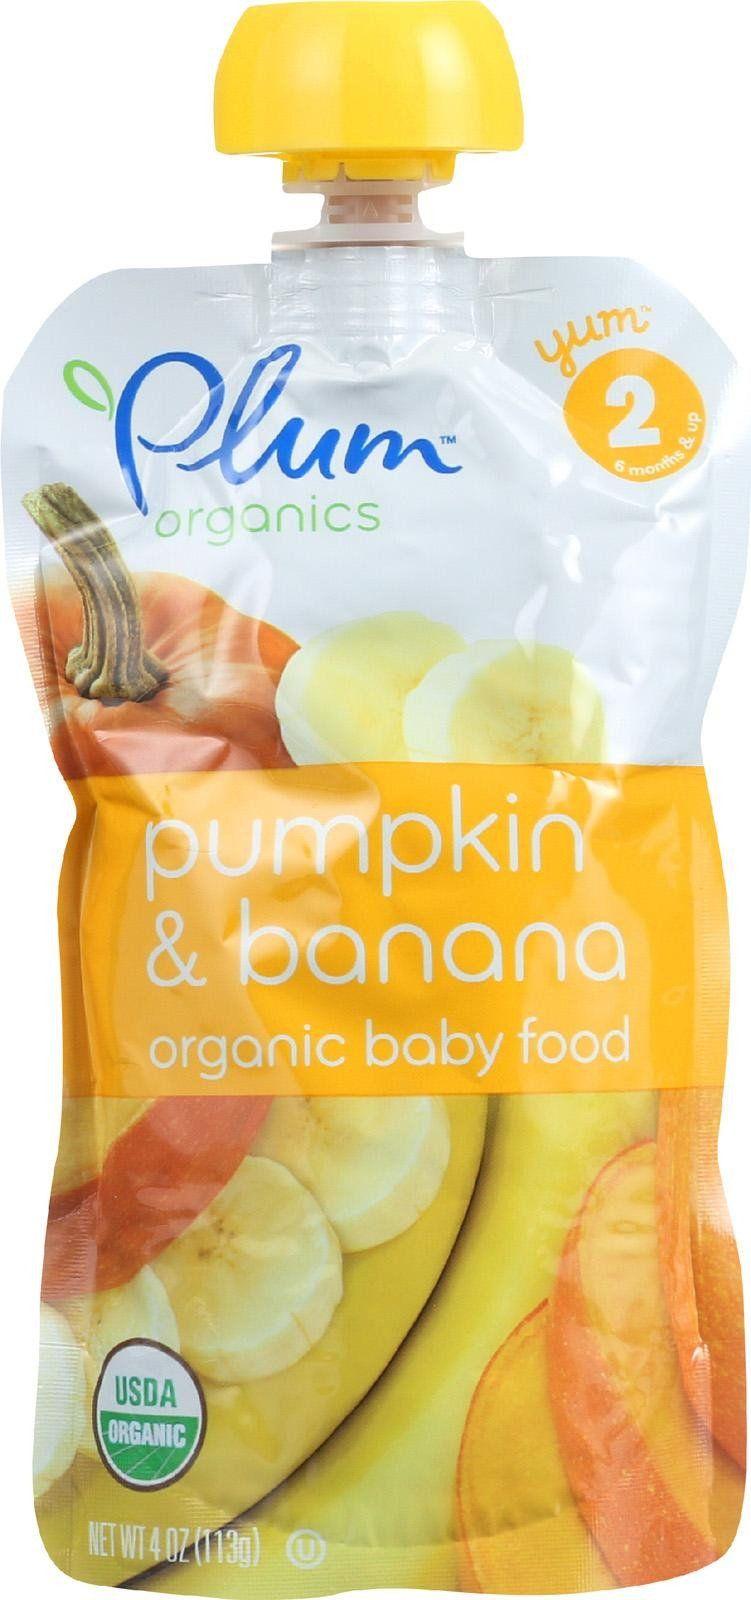 Plum organics baby food organic pumpkin and banana